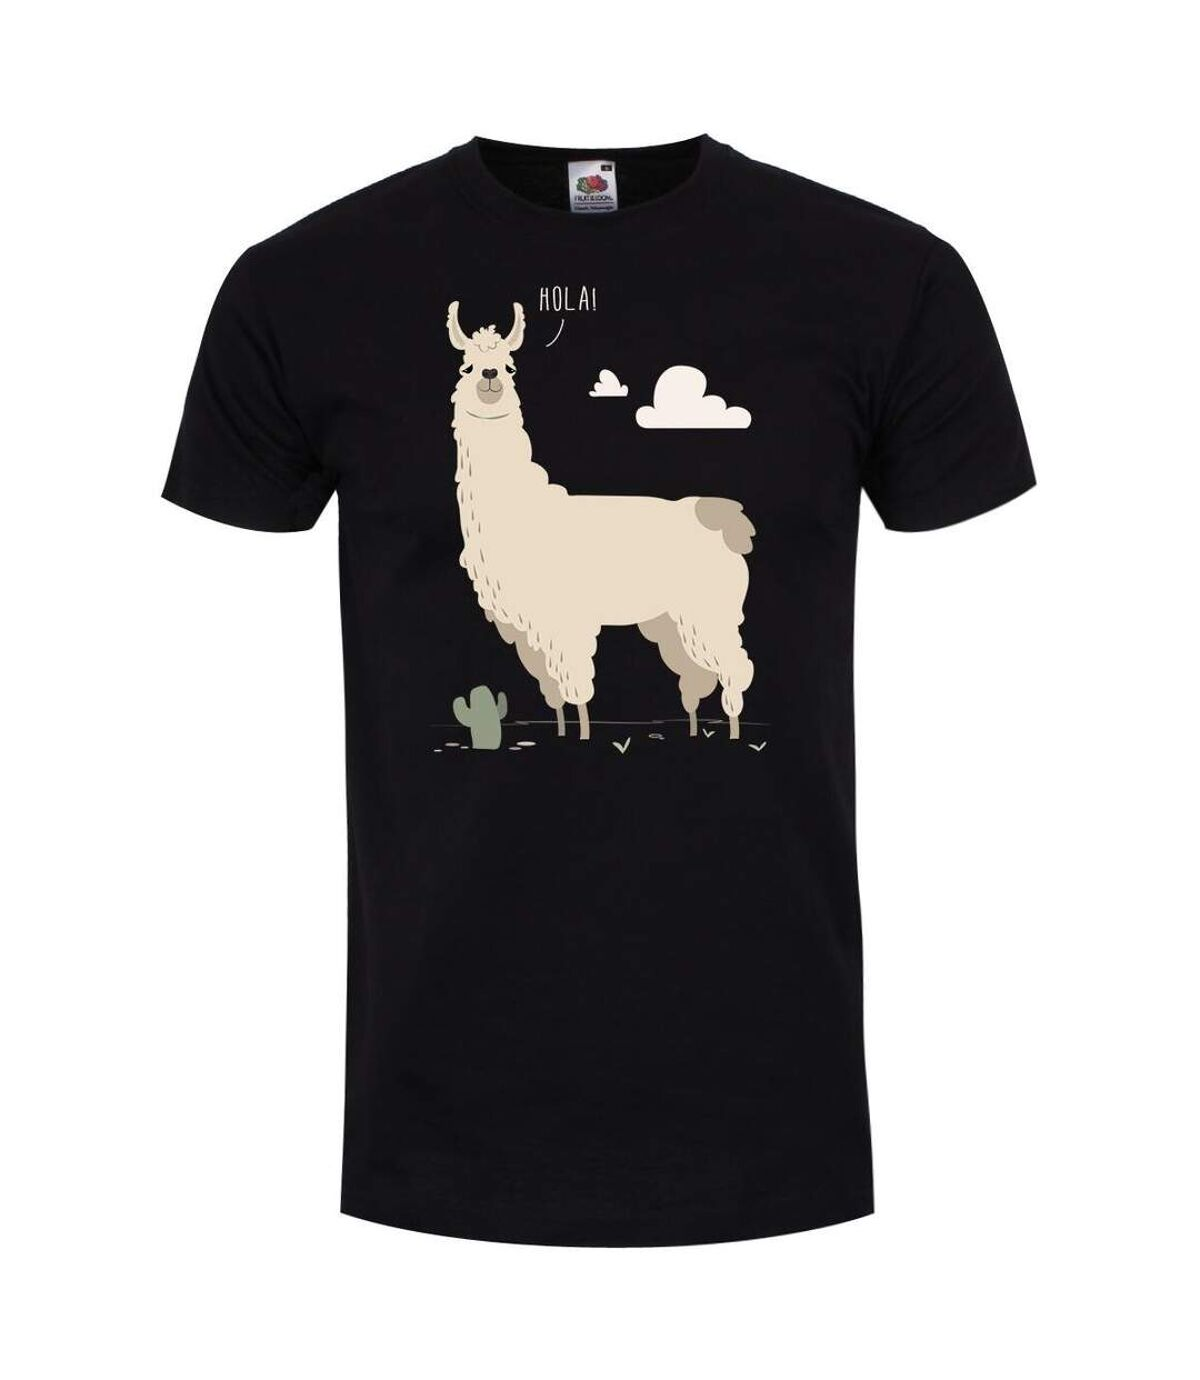 Grindstore T-Shirt Mens Hola ! Llama (Noir) - UTGR1862